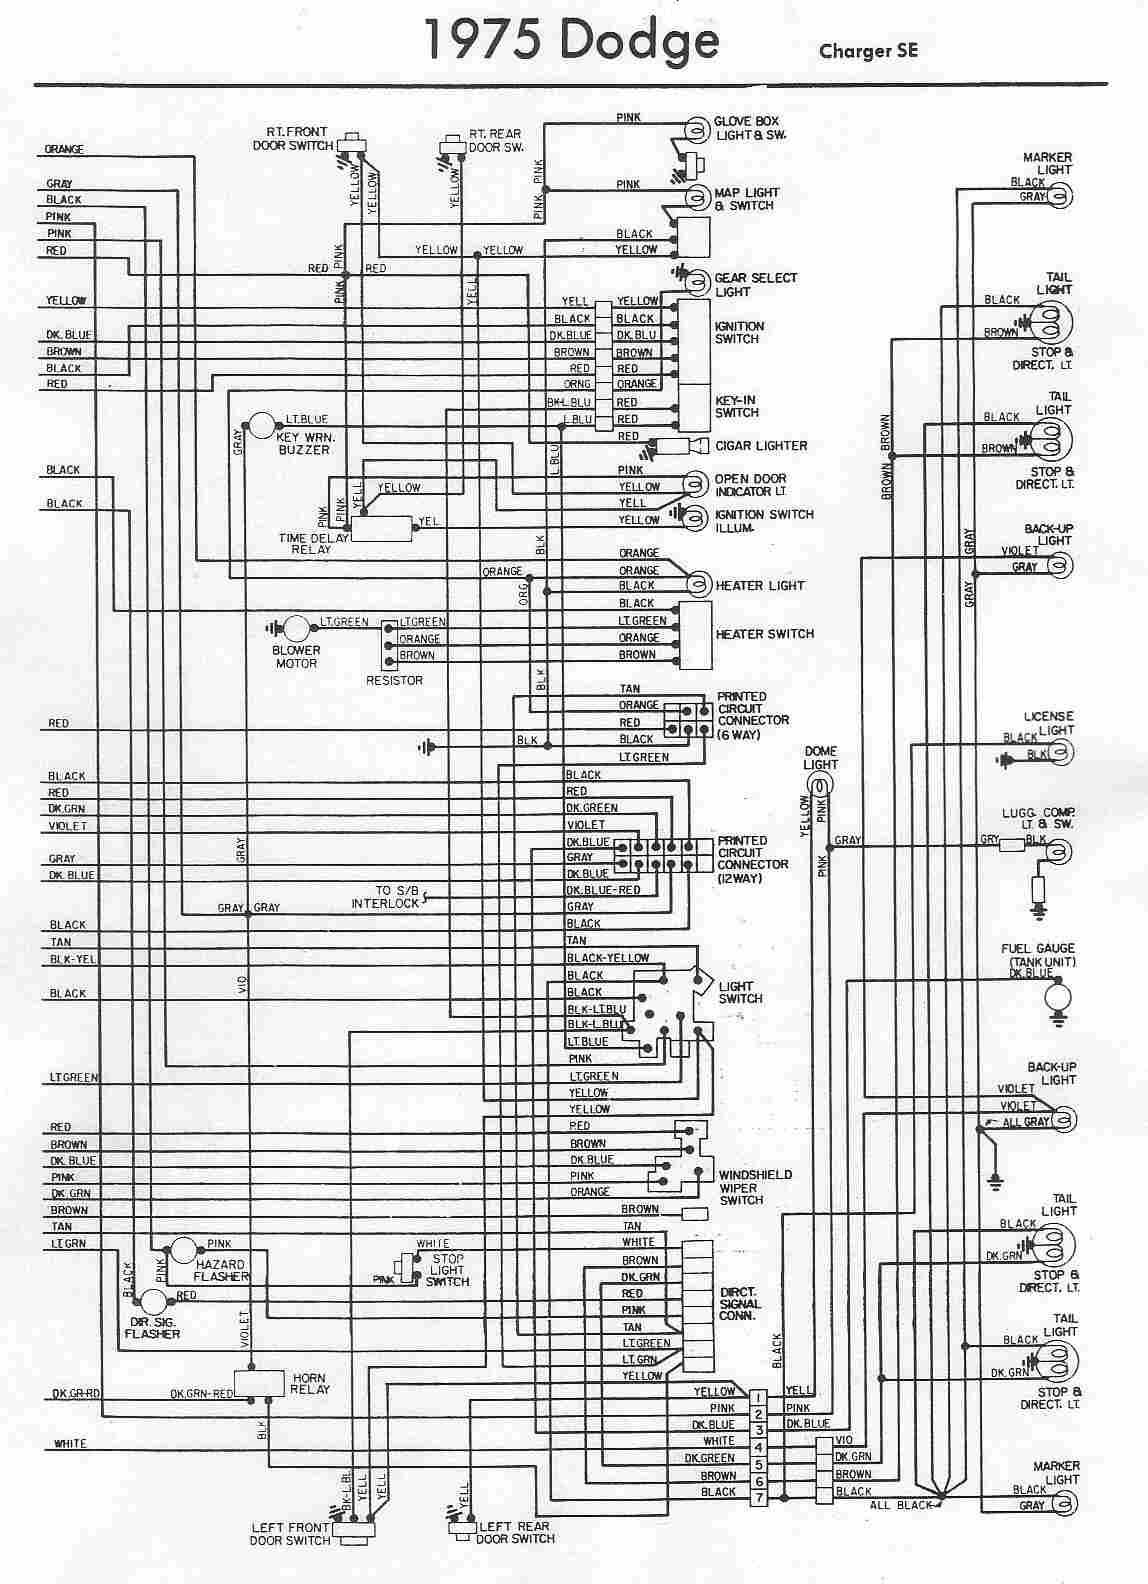 1976 dodge wiring diagram wiring diagram blog dodge nitro wiring diagrams dodge wiring diagrams [ 1148 x 1584 Pixel ]